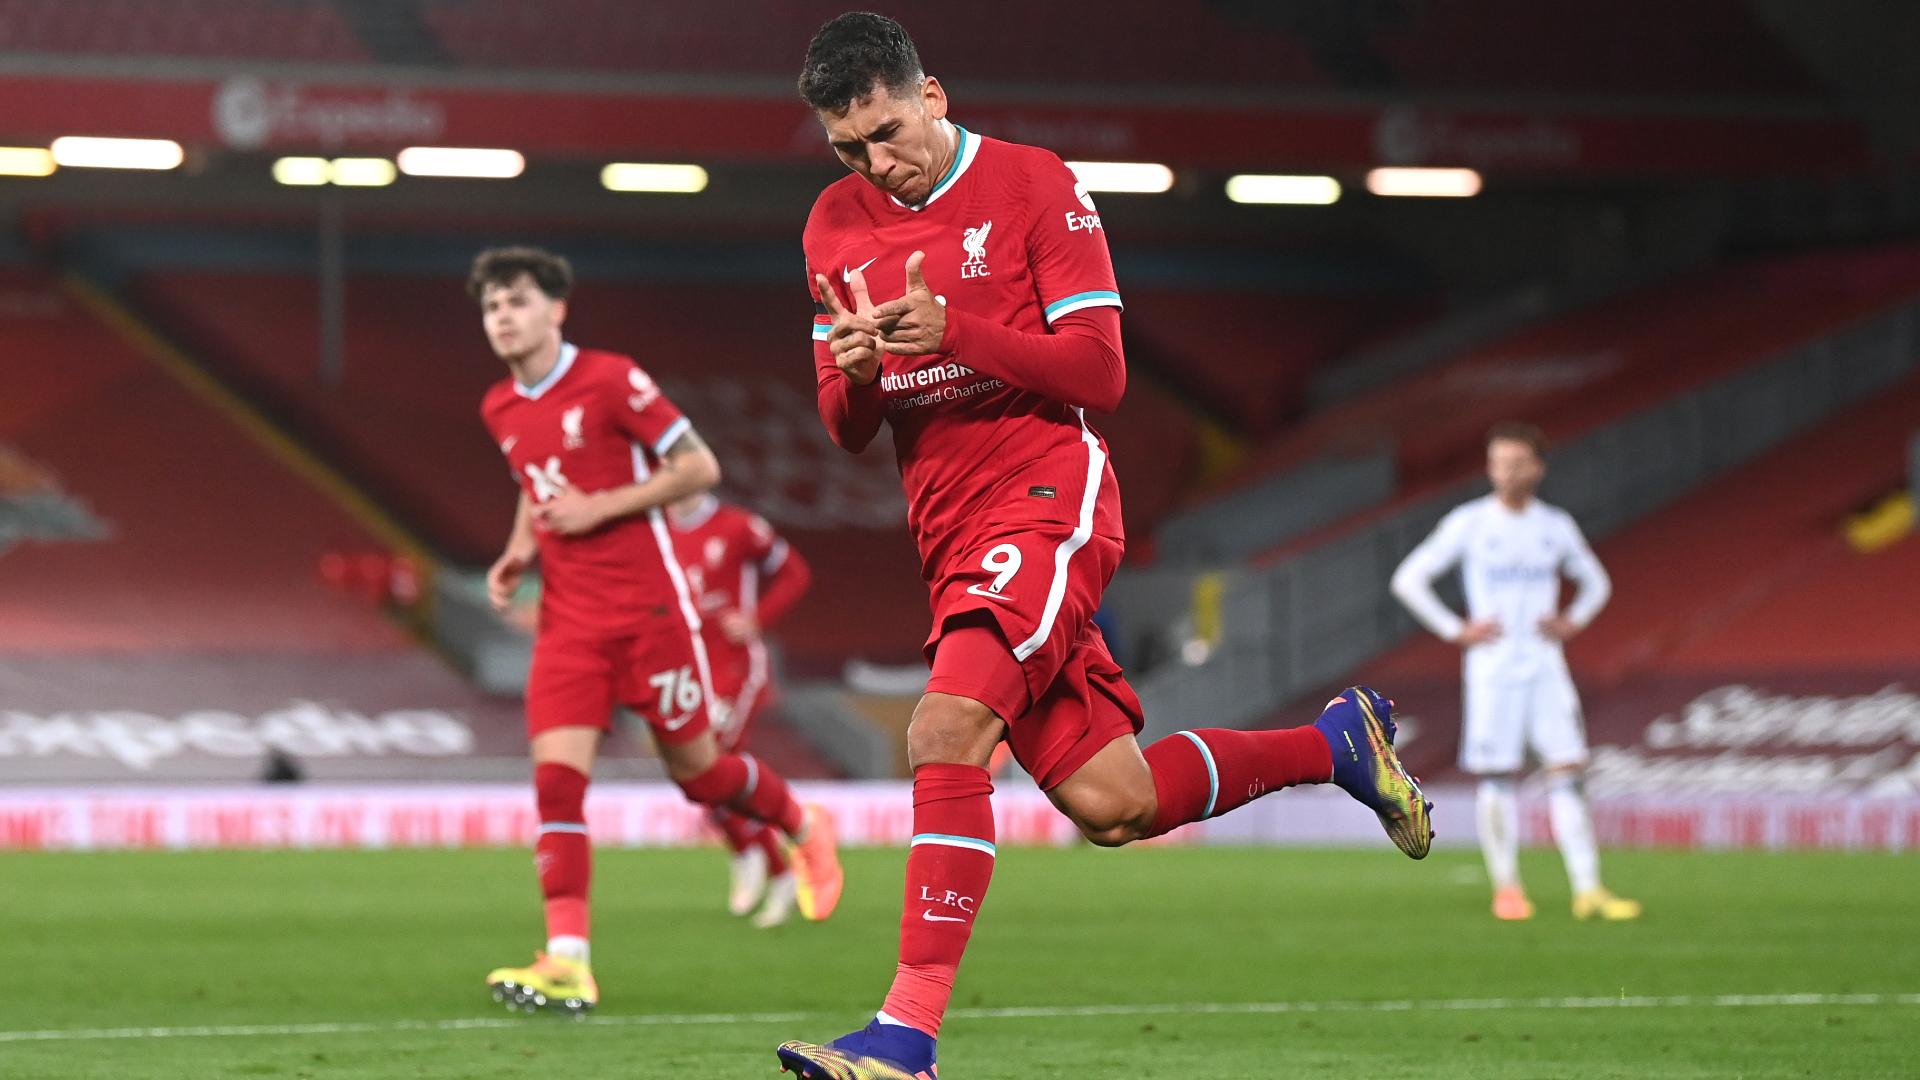 Klopp hails Firmino for 'super game' as Liverpool forward stars